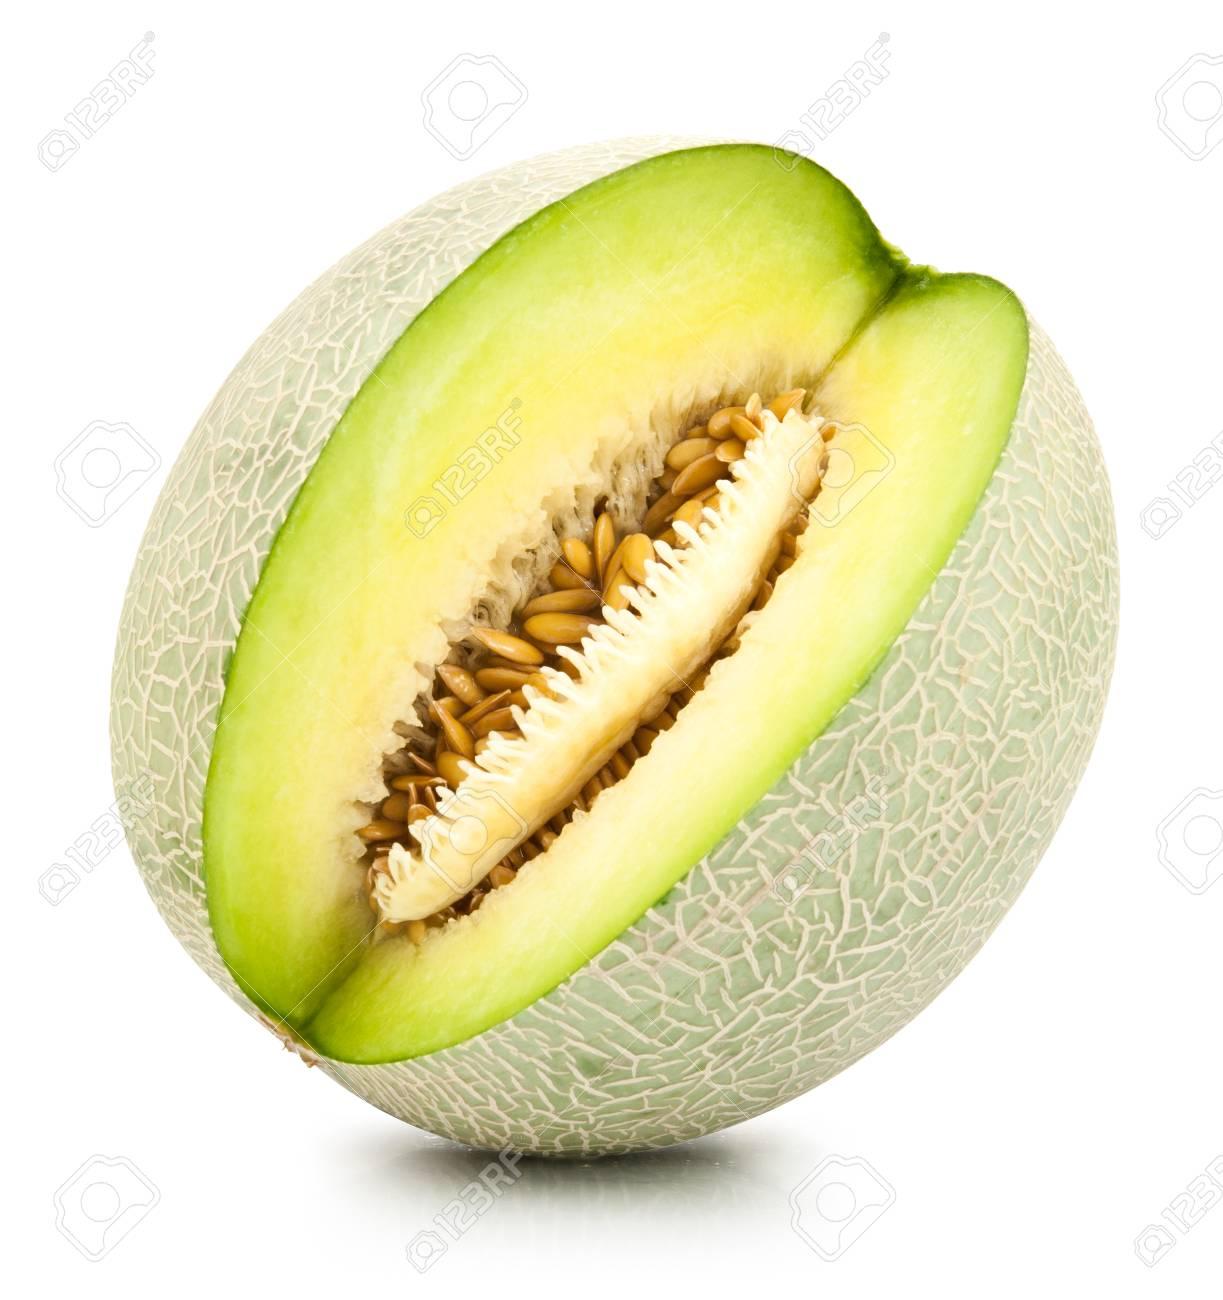 Green Cantelope – Melon cantaloupe isolated on white background.